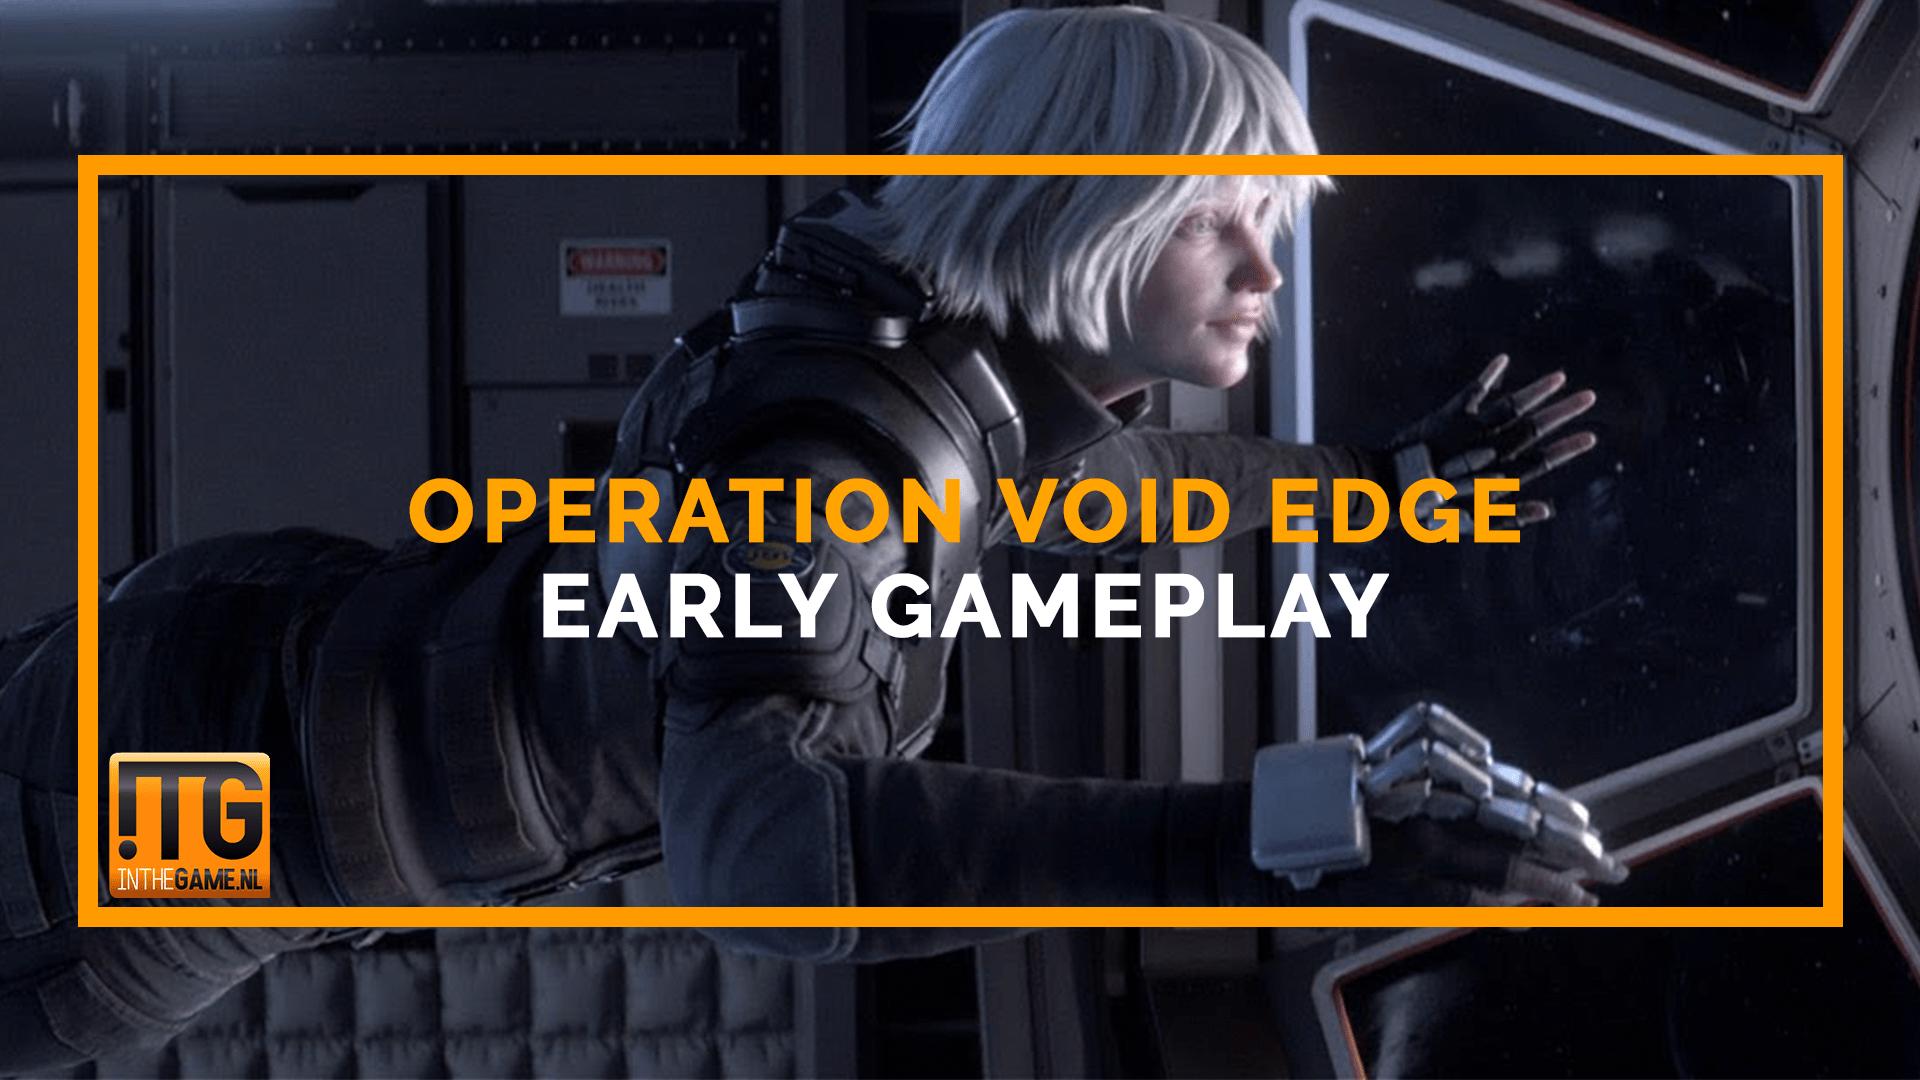 Operation Void Edge